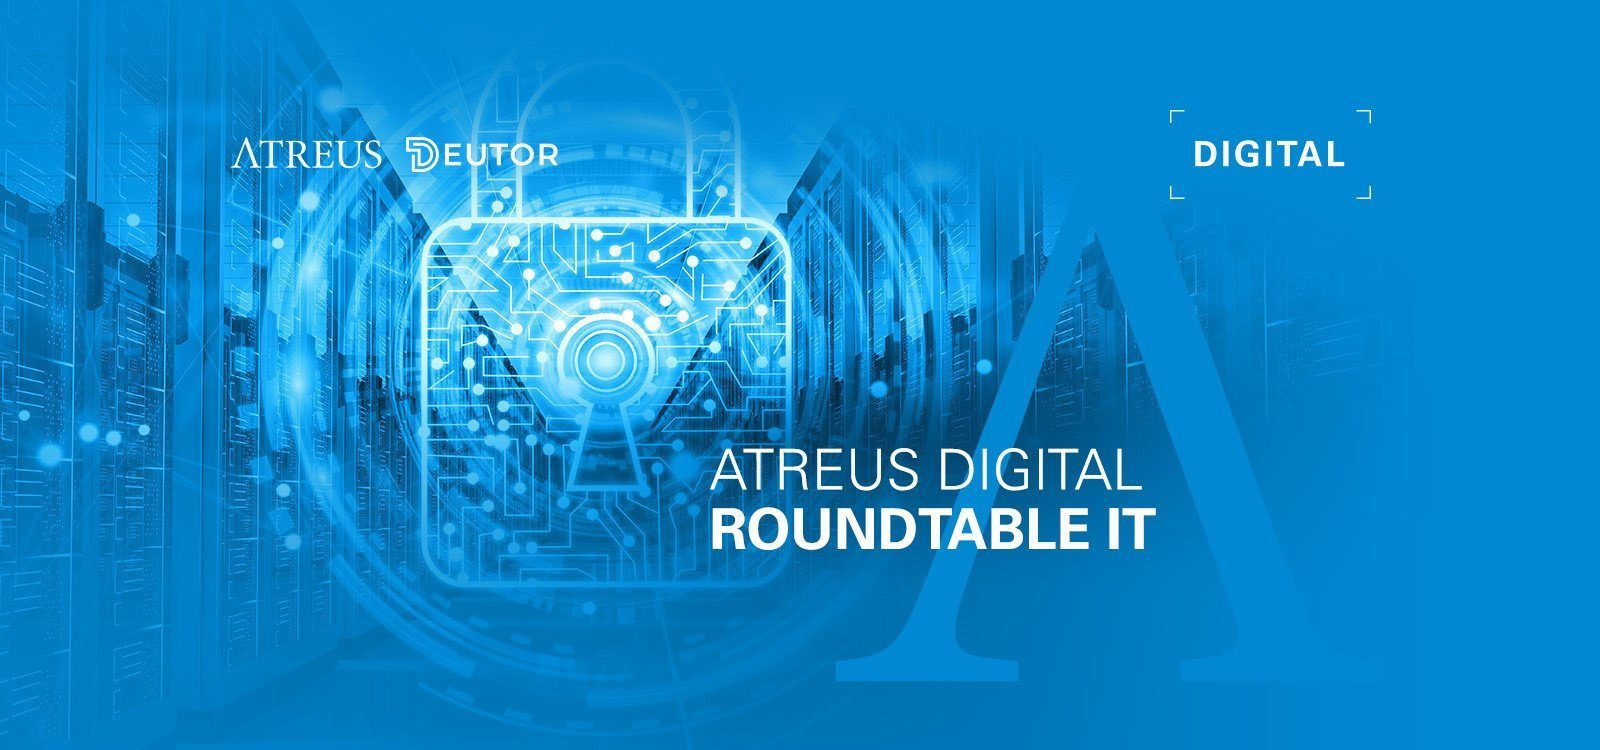 Atreus Digital Roundtable IT